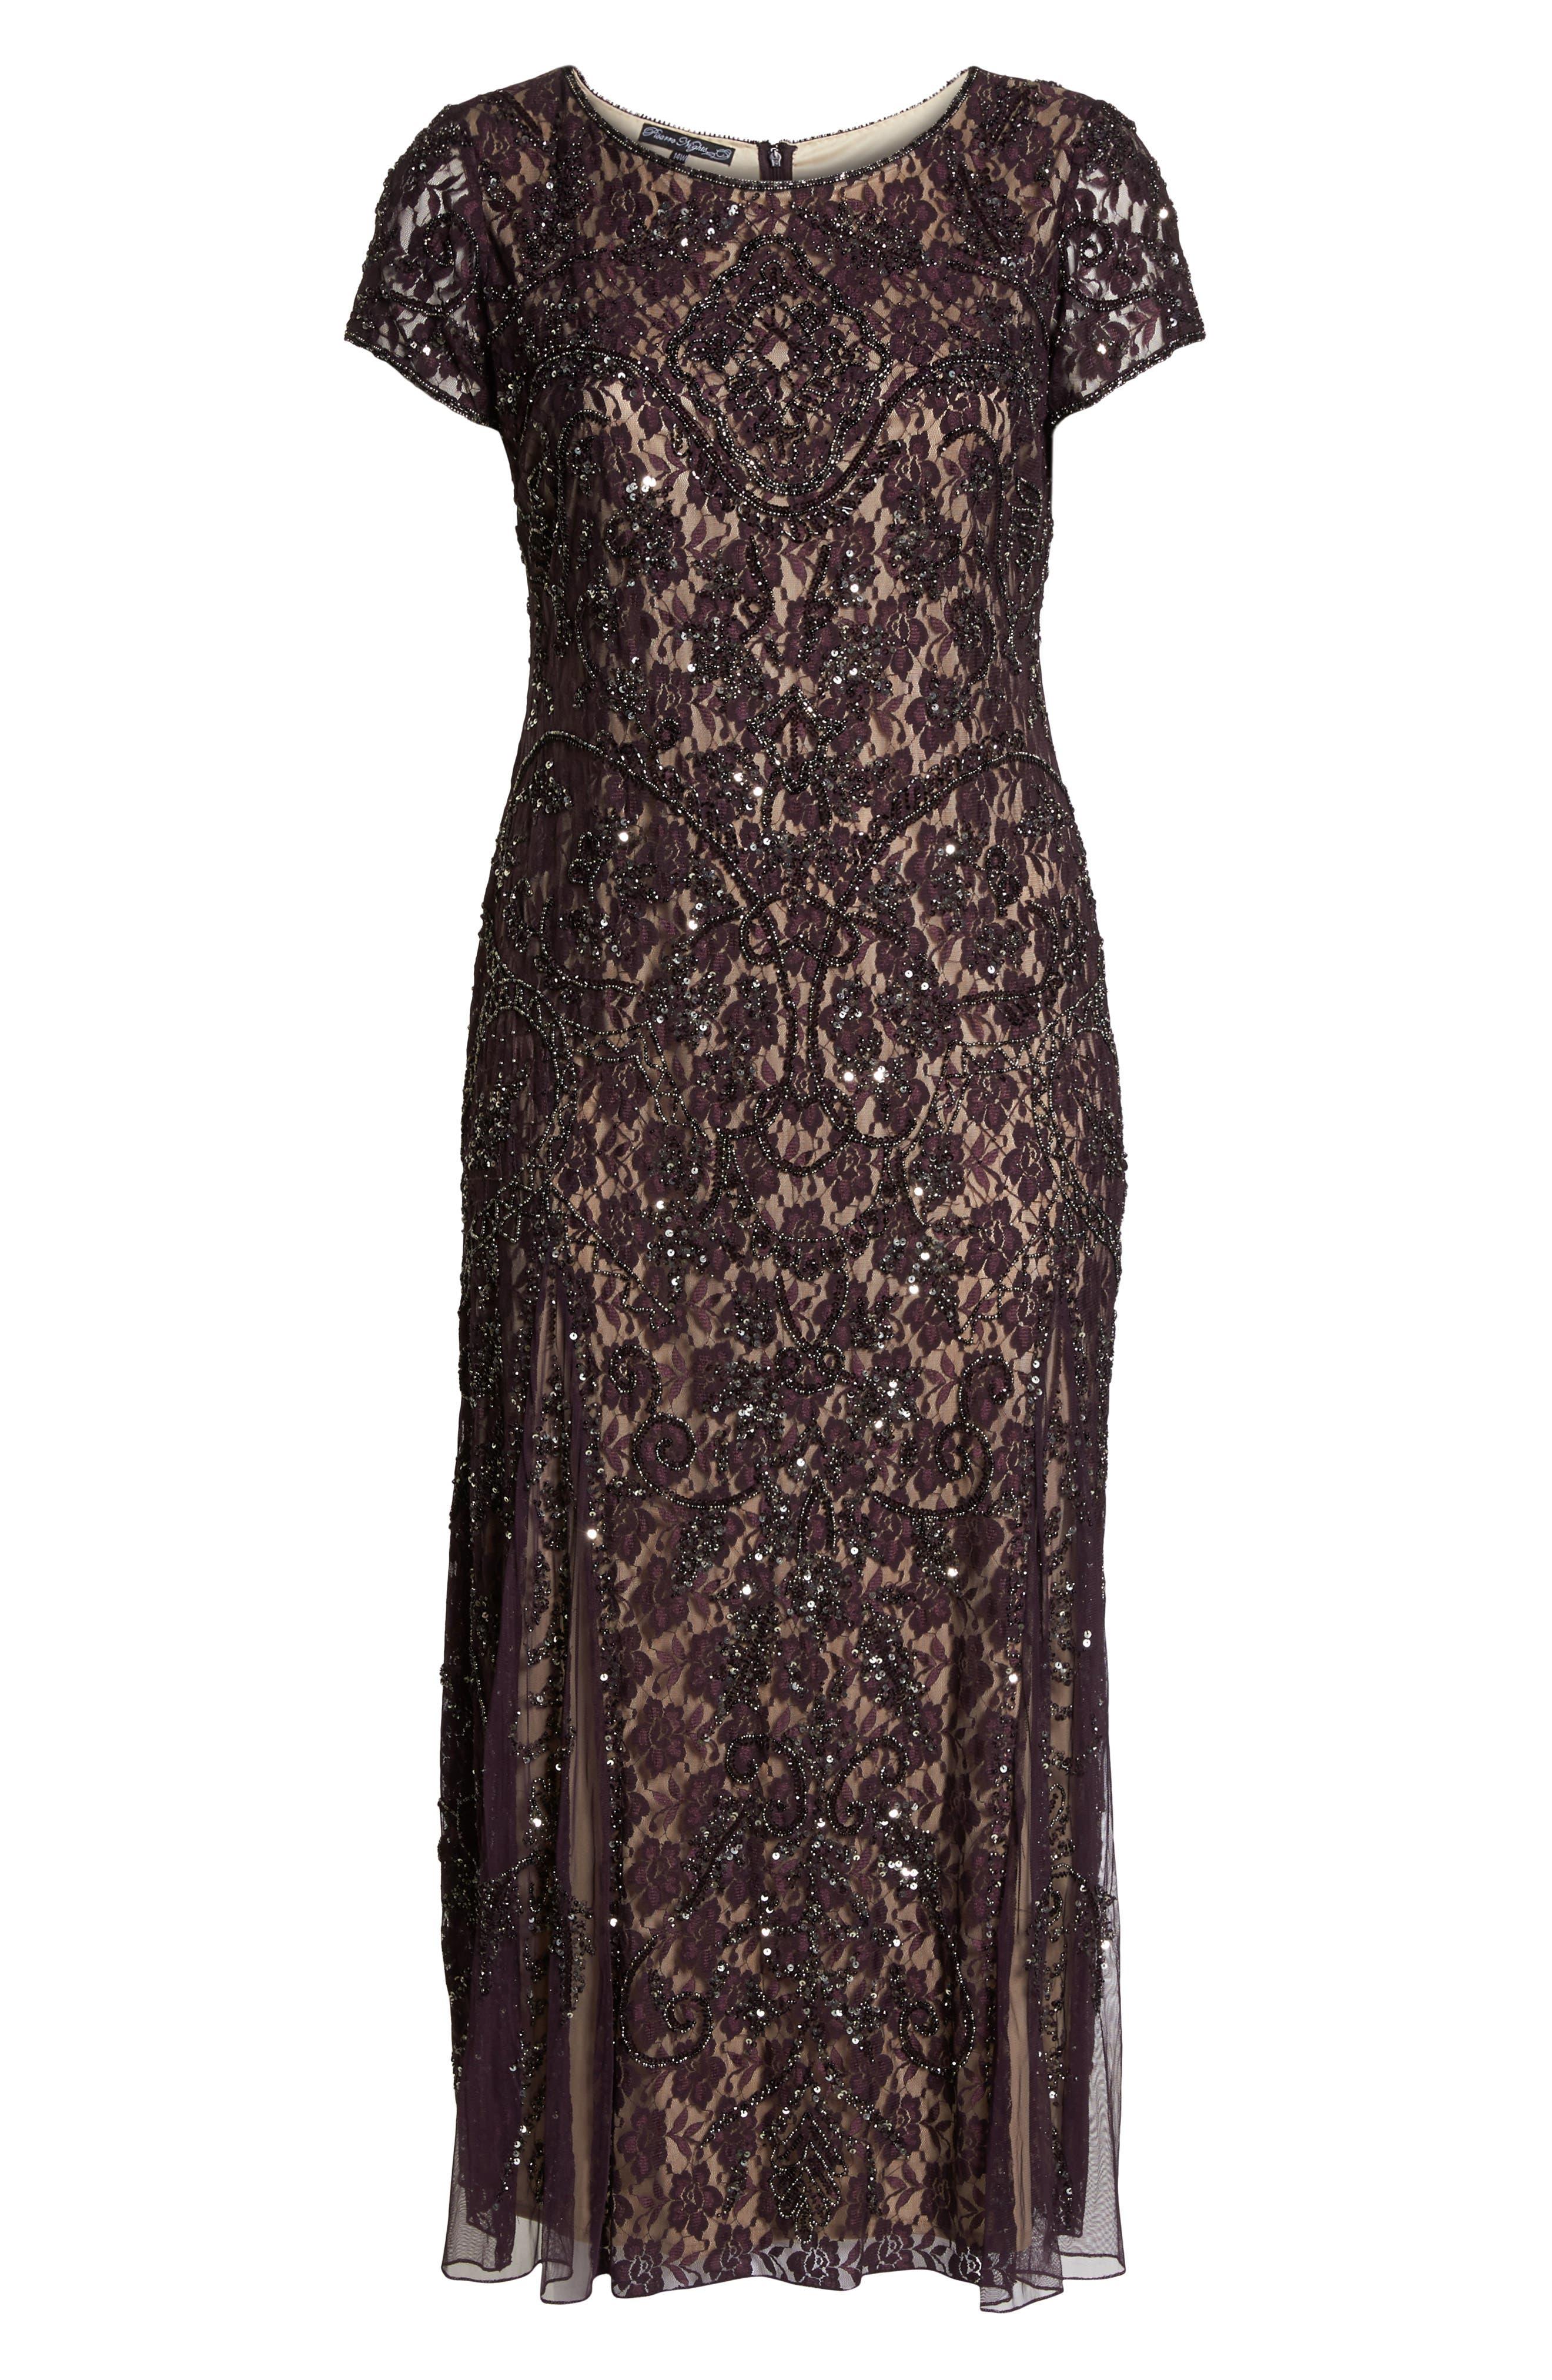 Embellished Lace A-Line Dress,                             Alternate thumbnail 6, color,                             502